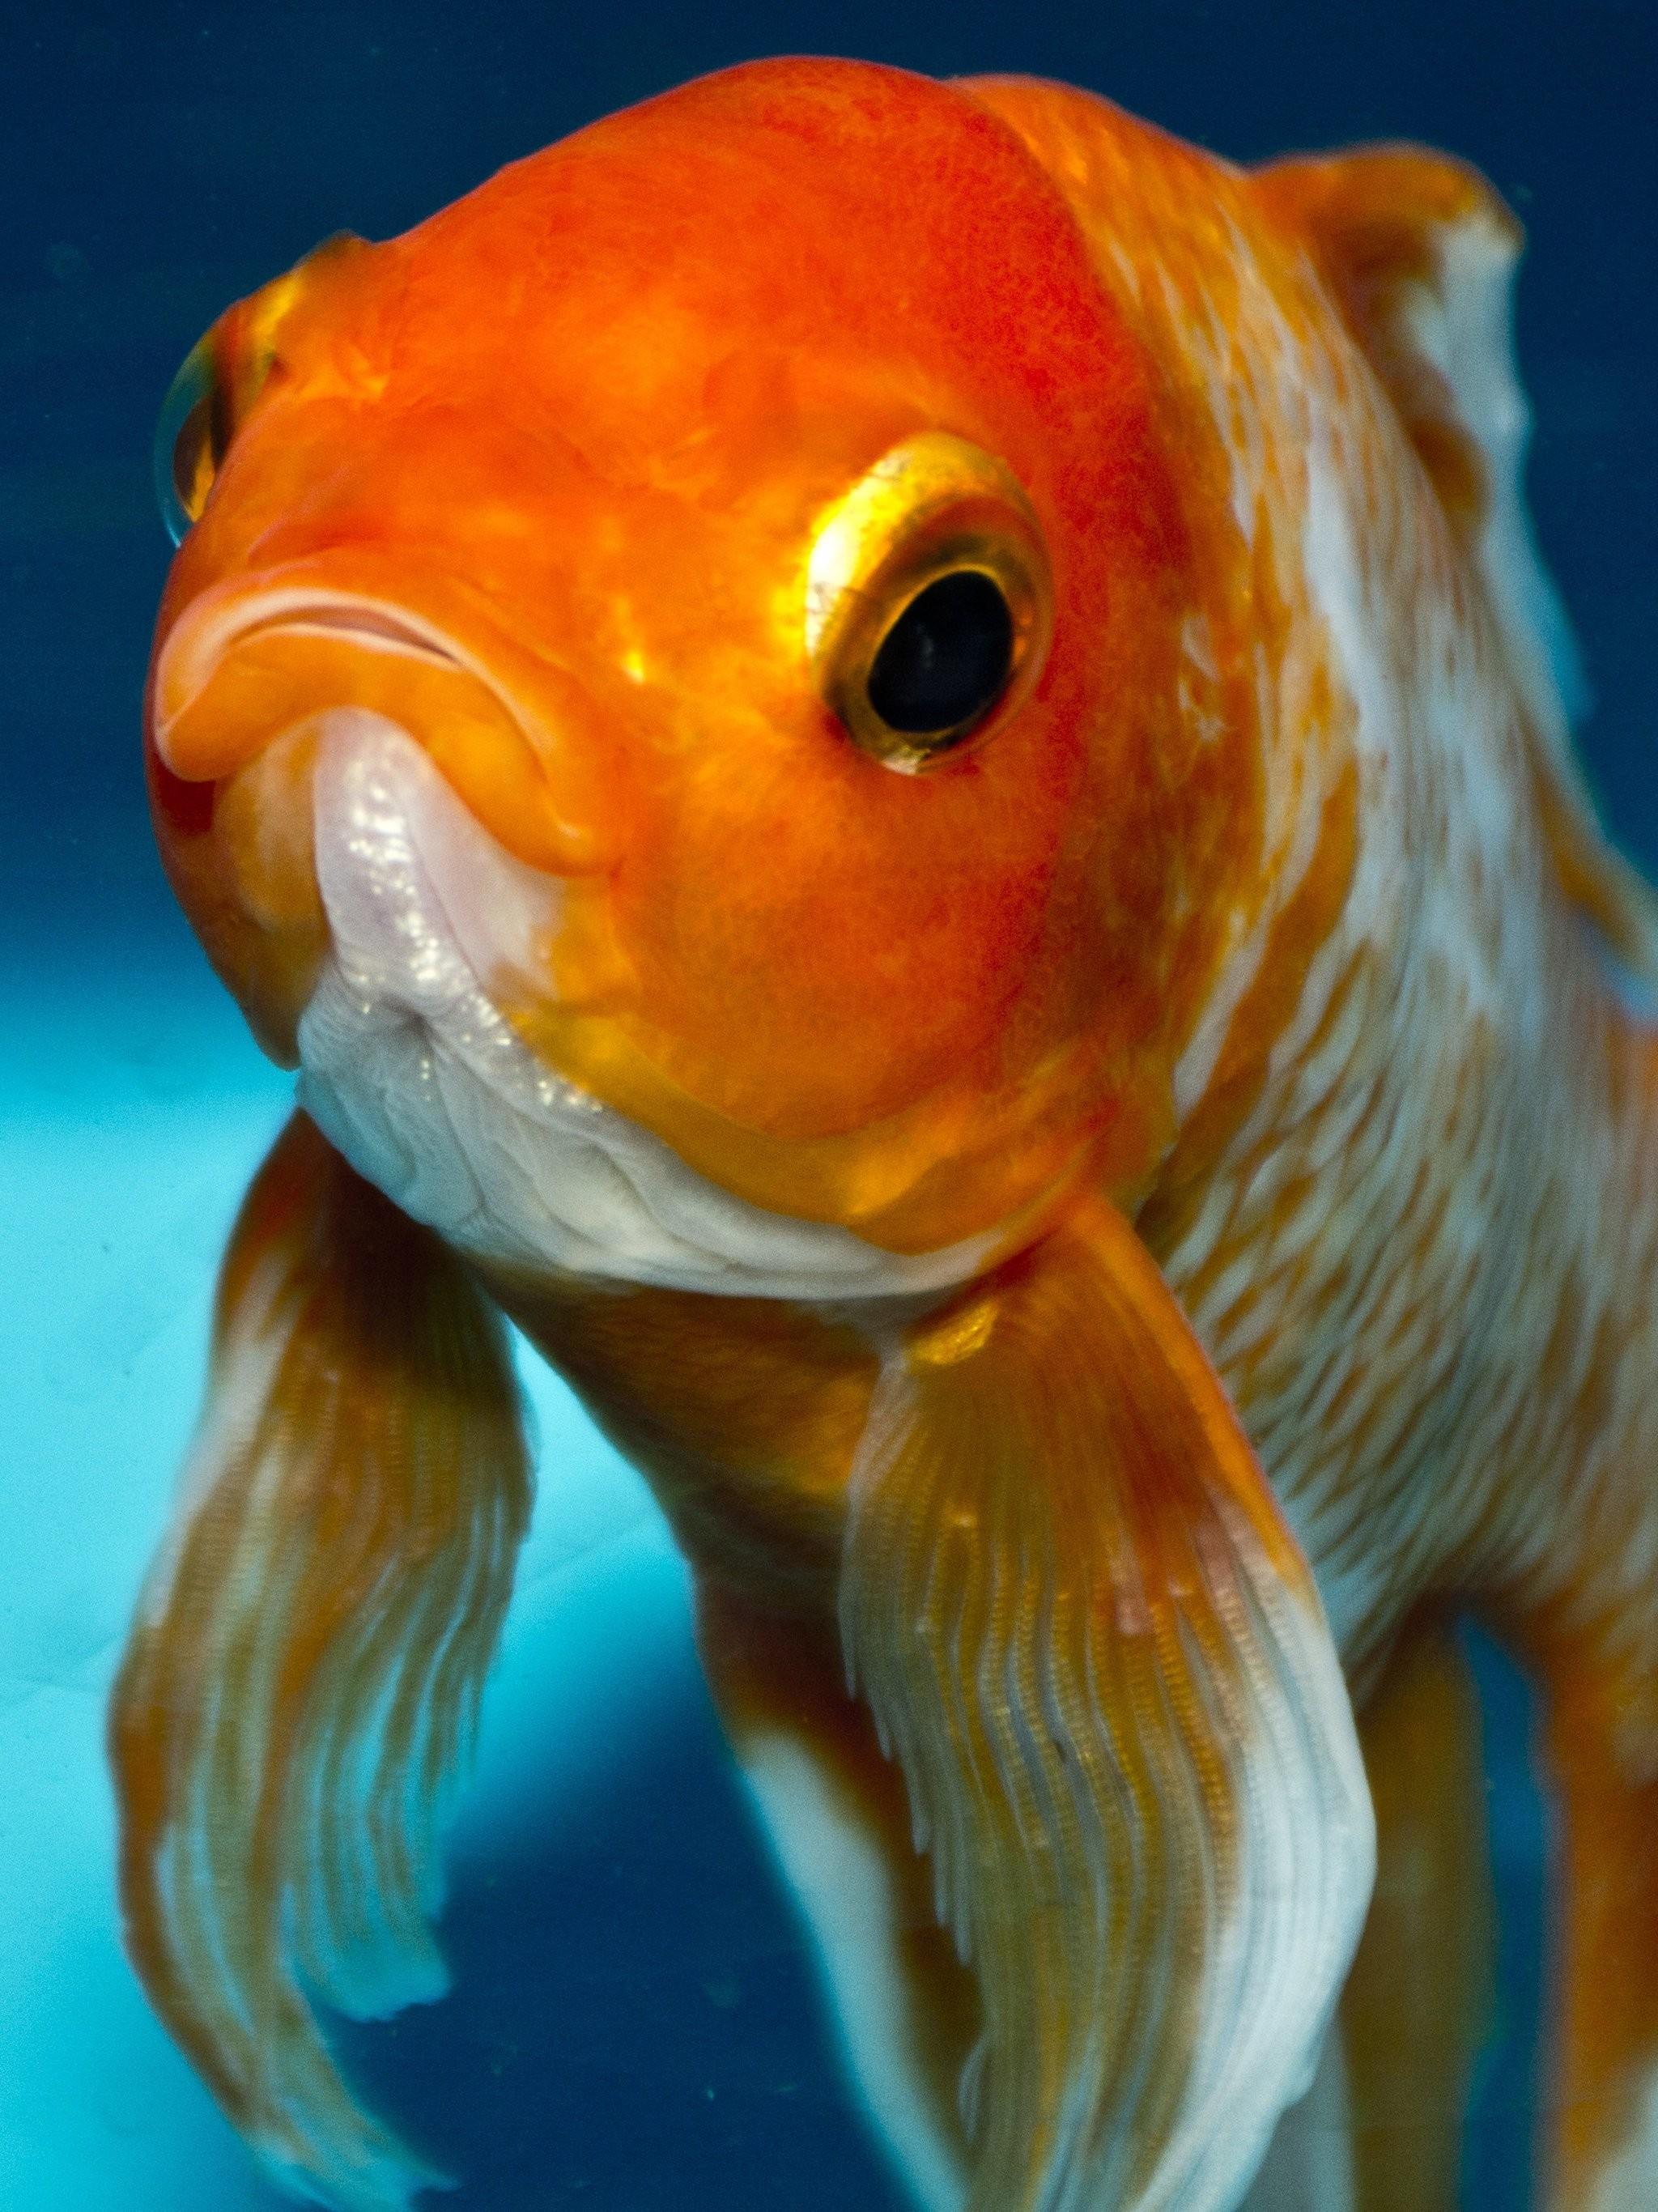 Gold Fish Wallpaper (67+ images)